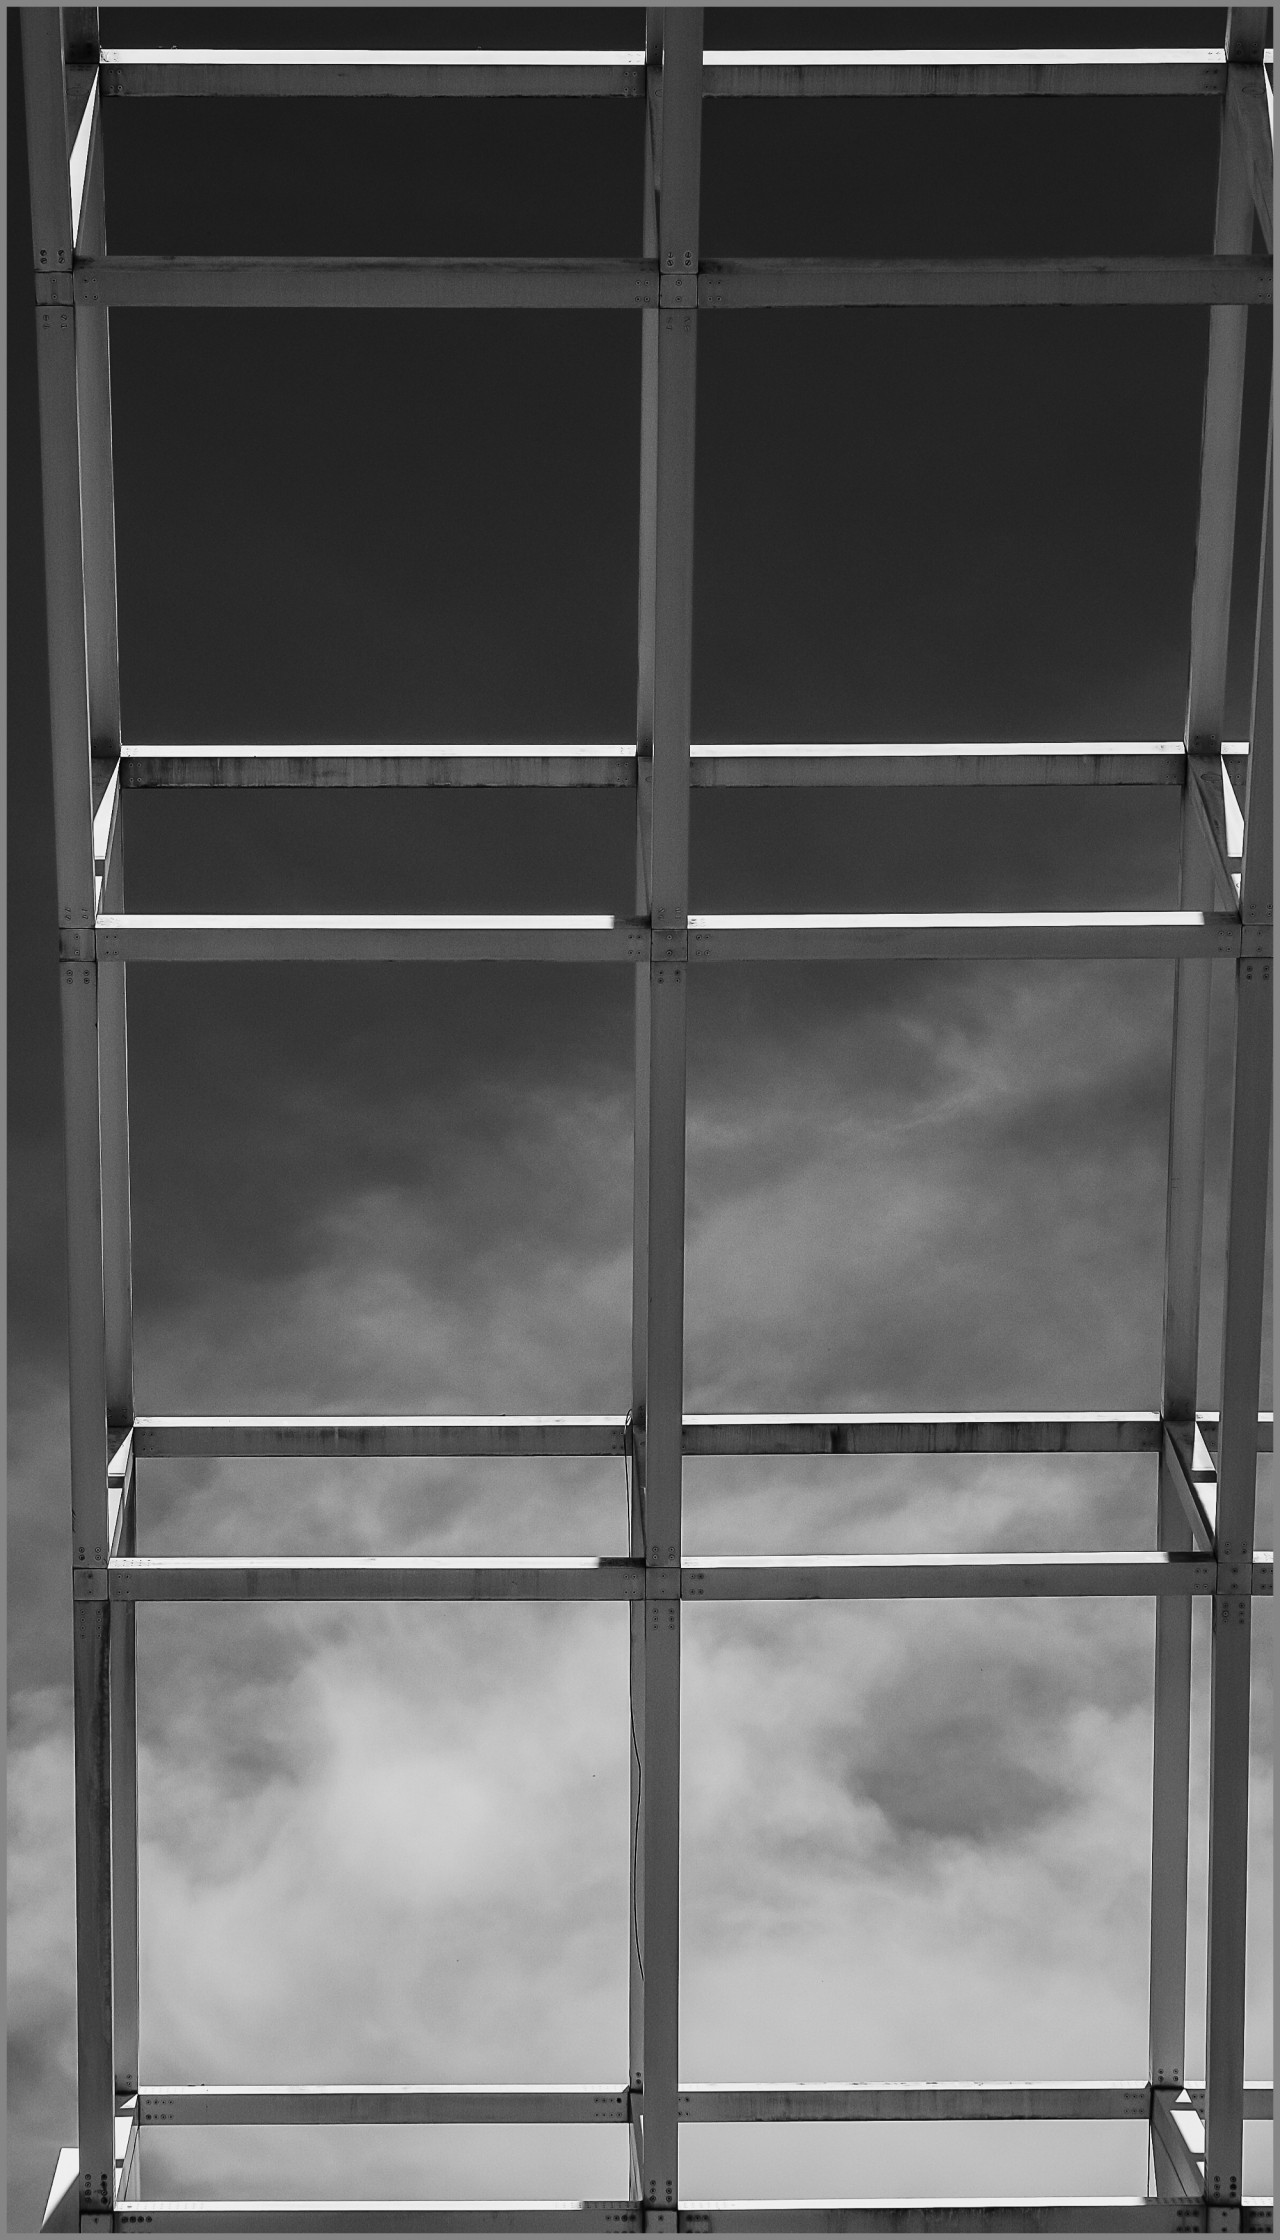 Monochrome Mondays: Passage toheaven